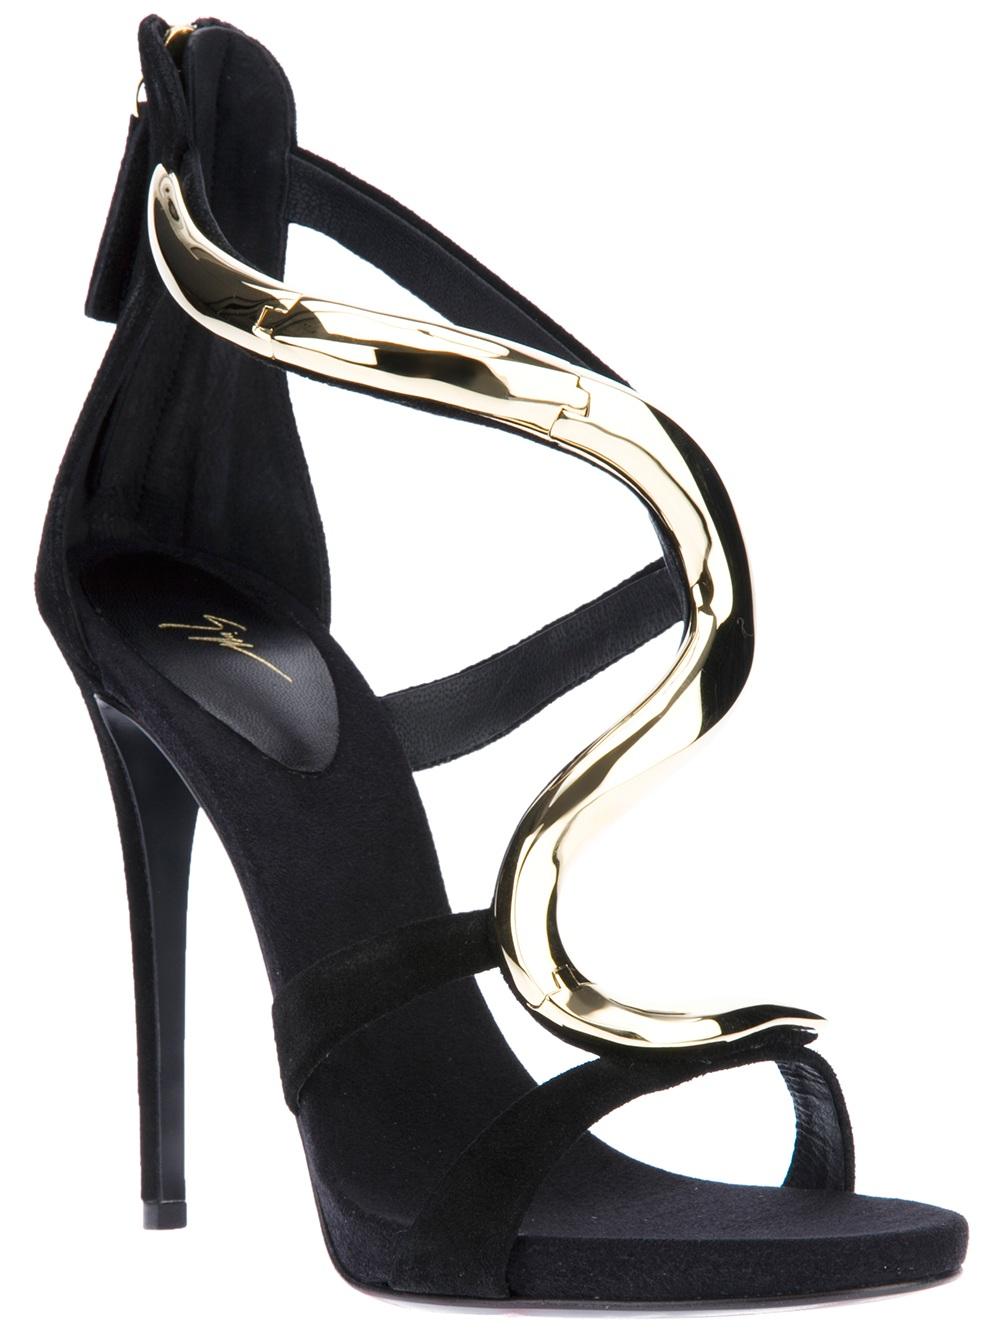 Black sandals heels - Gallery